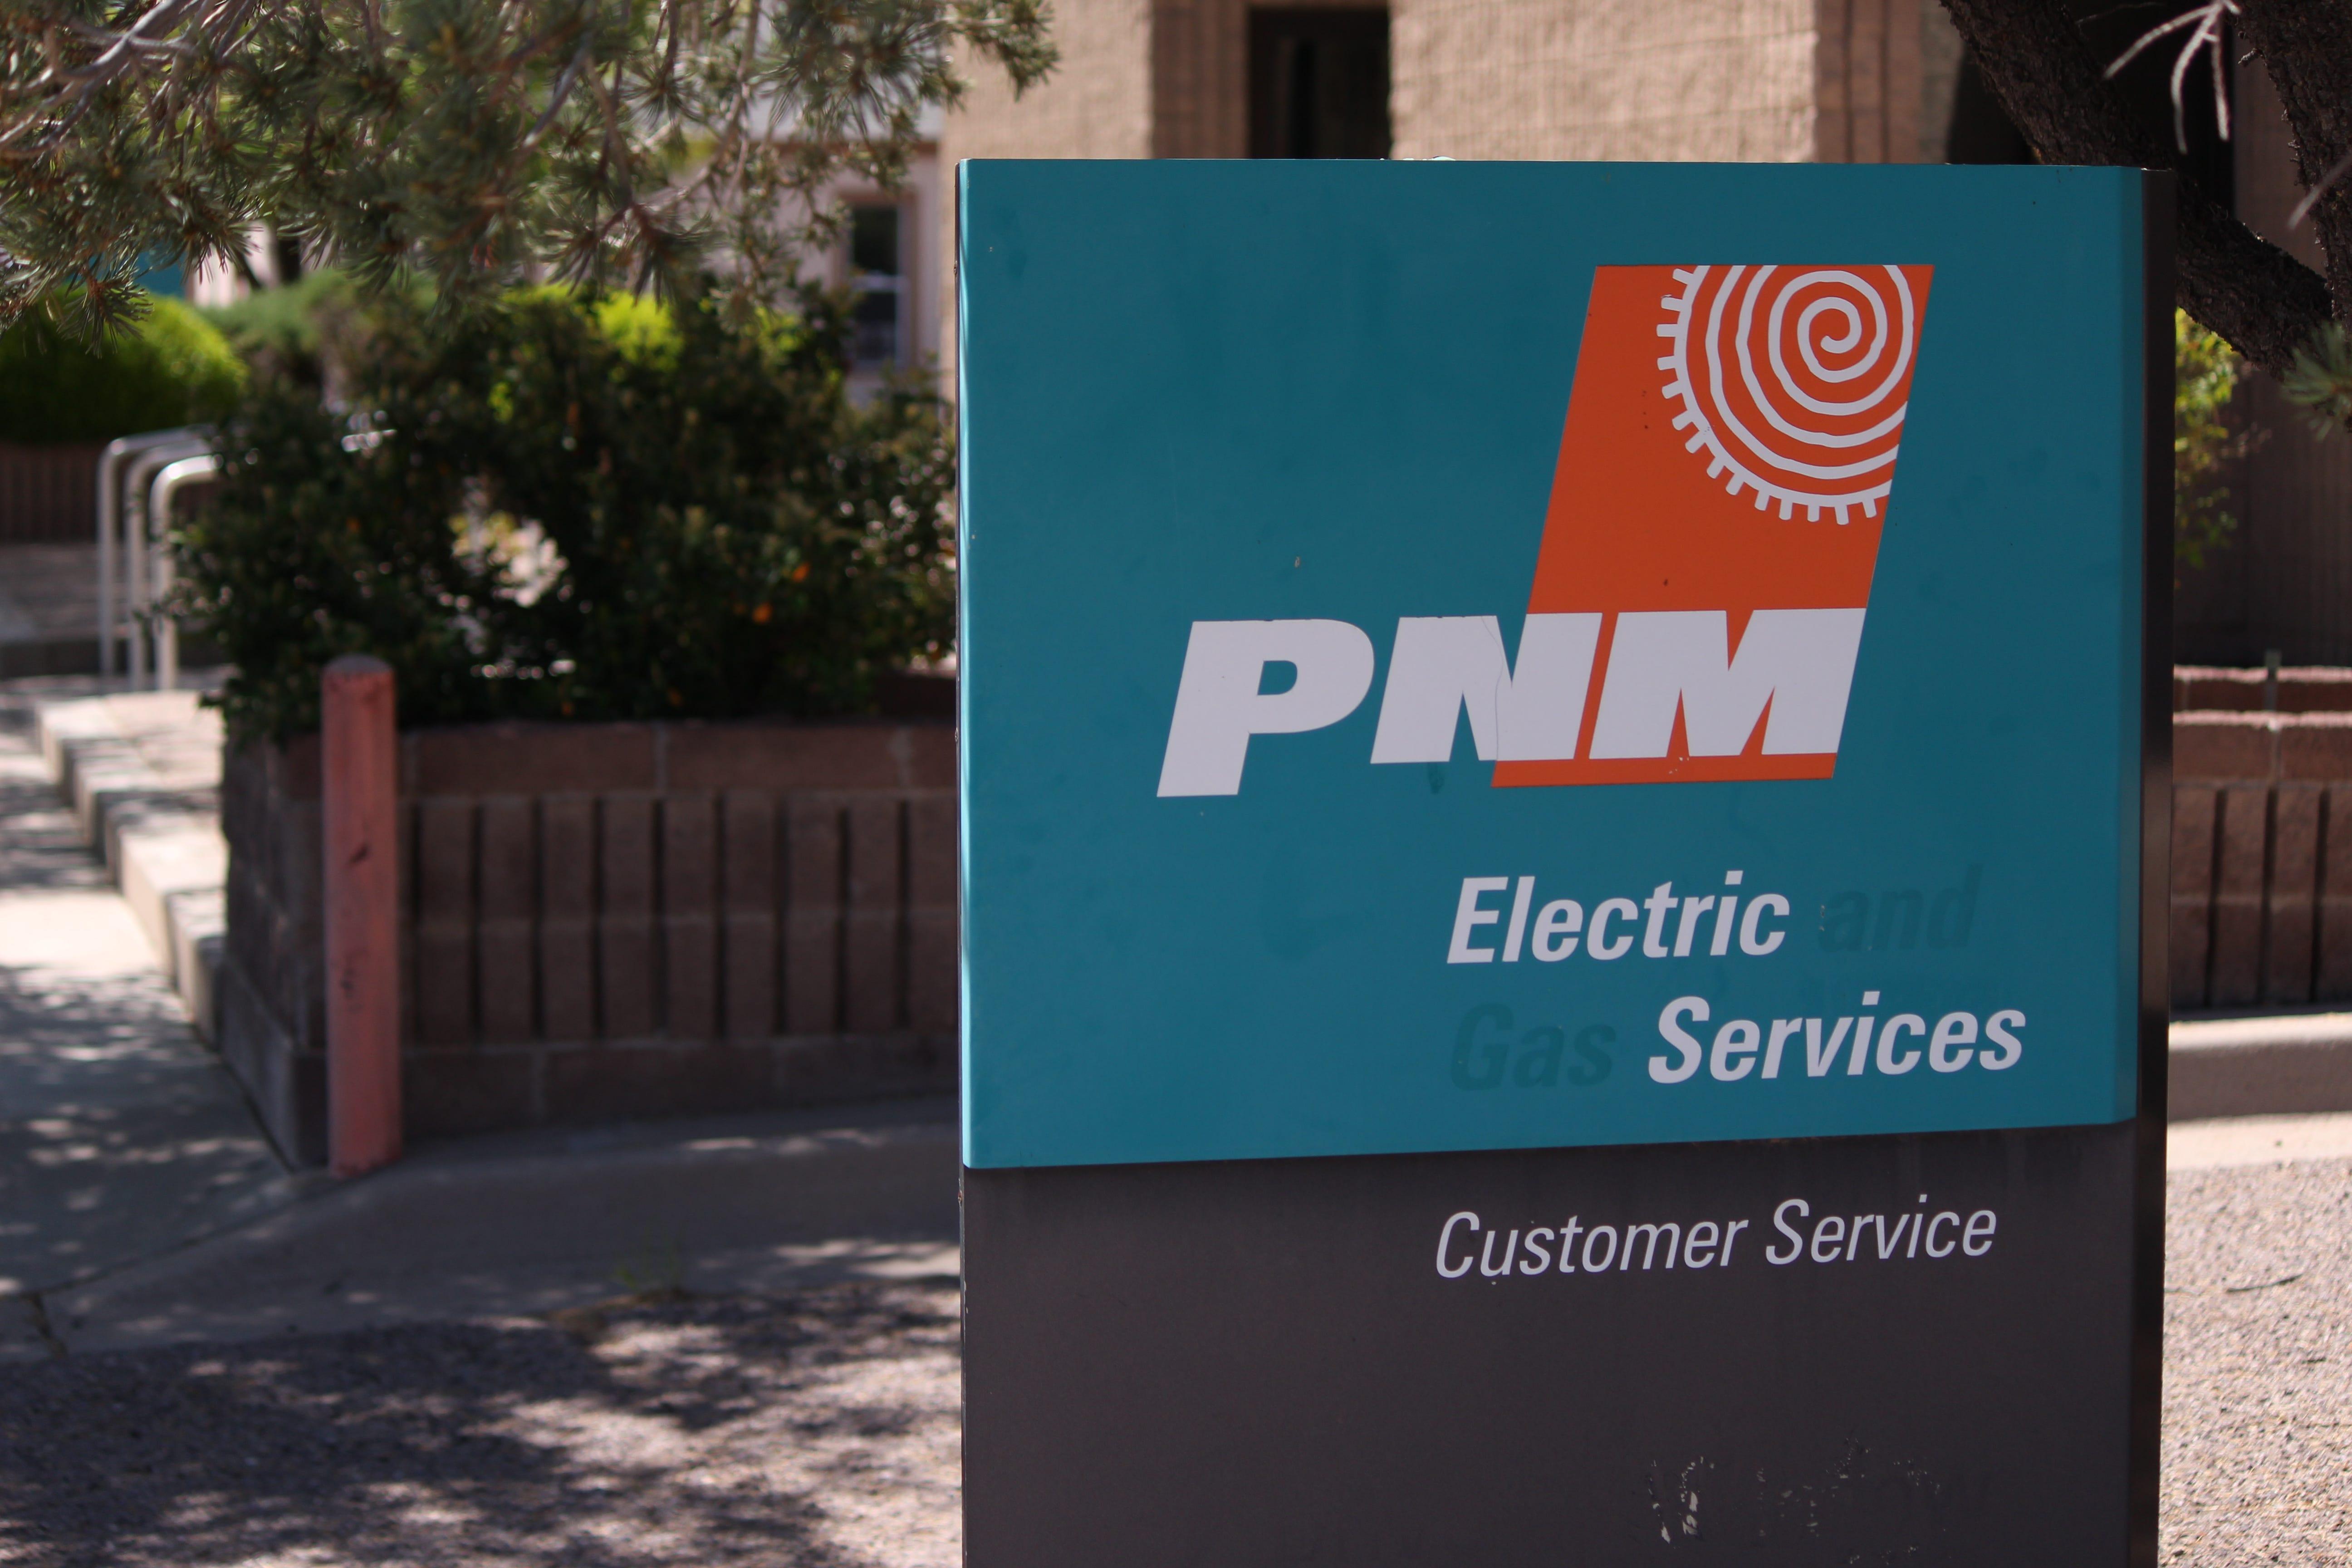 Pnm customer service phone number